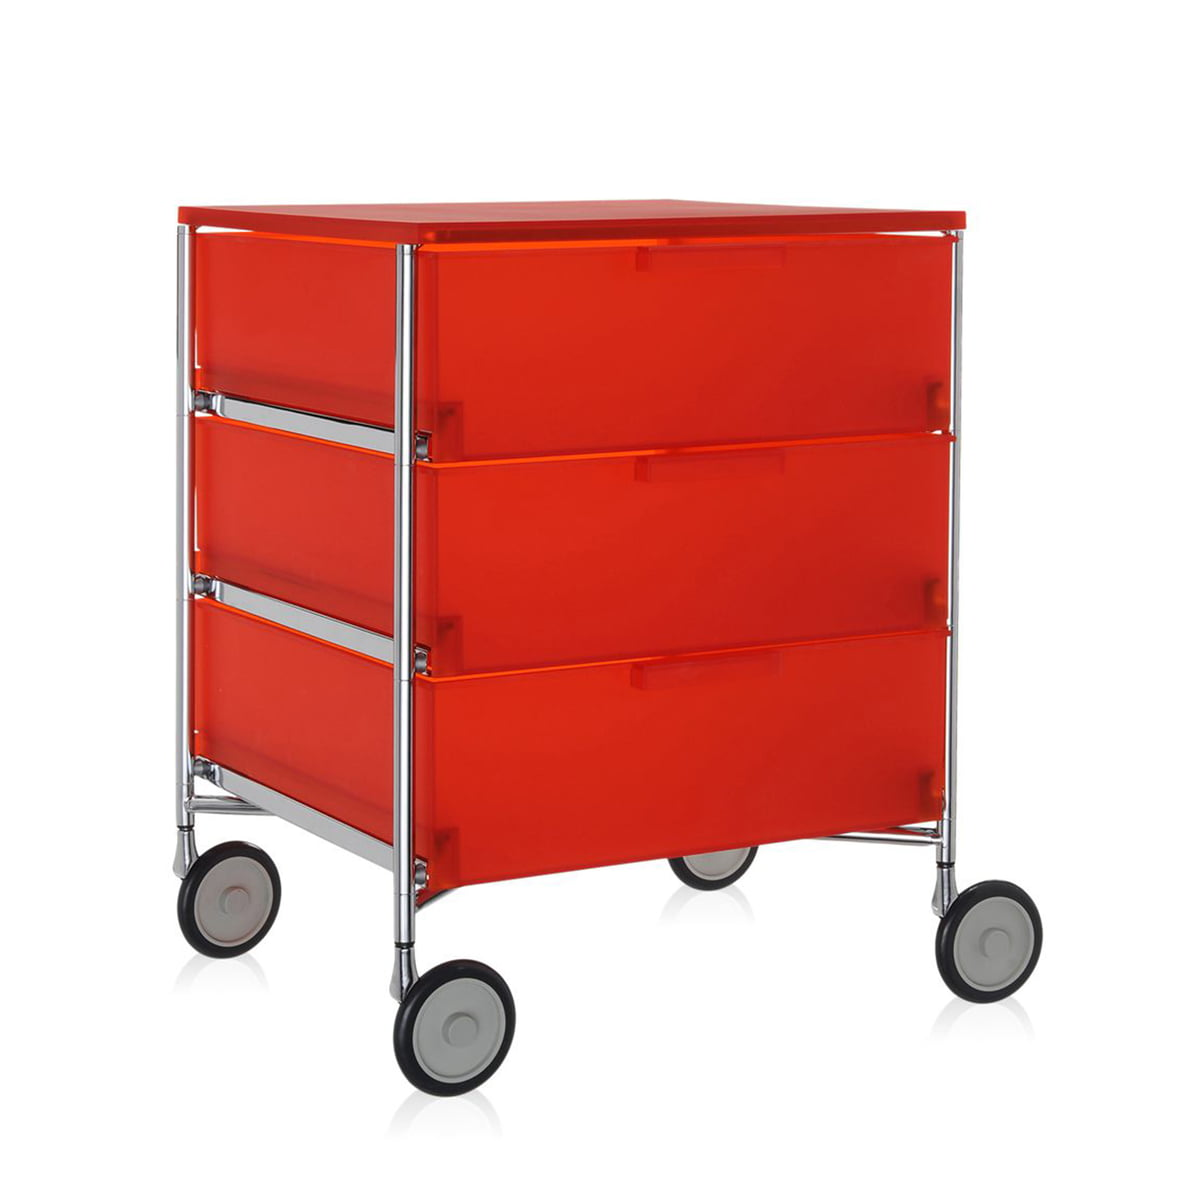 Mobil Container Rollen | Kartell | Shop, Badezimmer